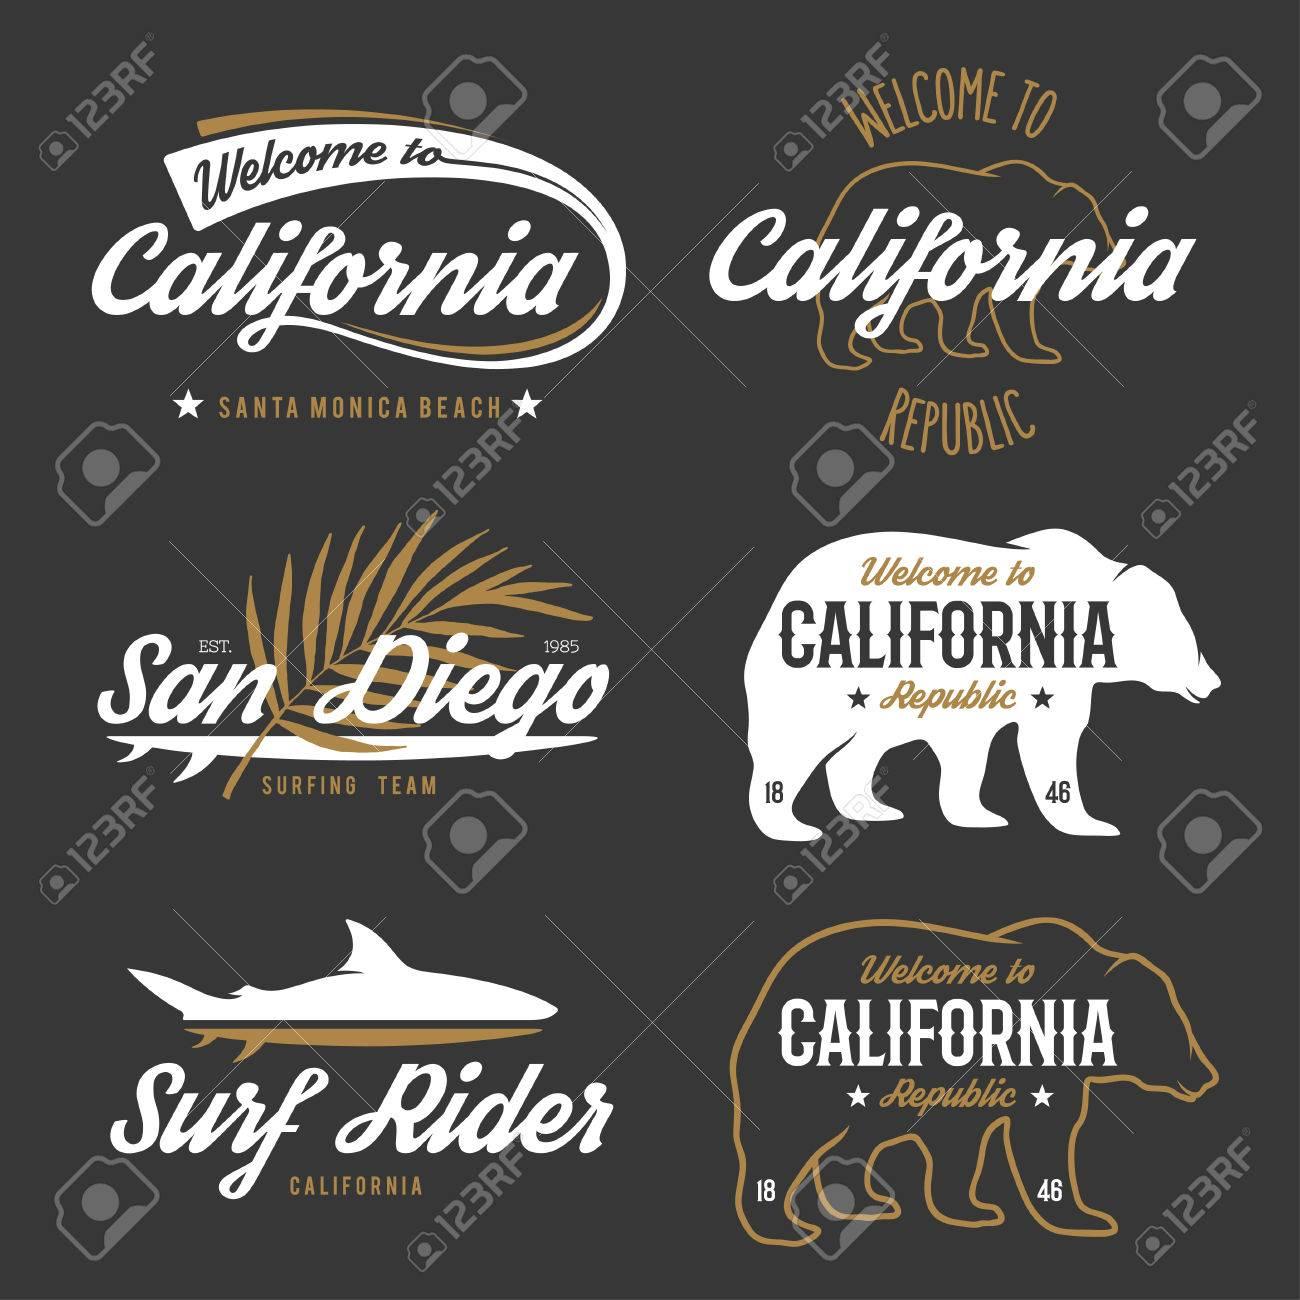 Shirt design elements - Vector Vector Vintage Monochrome California Badges Design Elements For T Shirt Print Lettering Typography Illustrations California Republic Bear